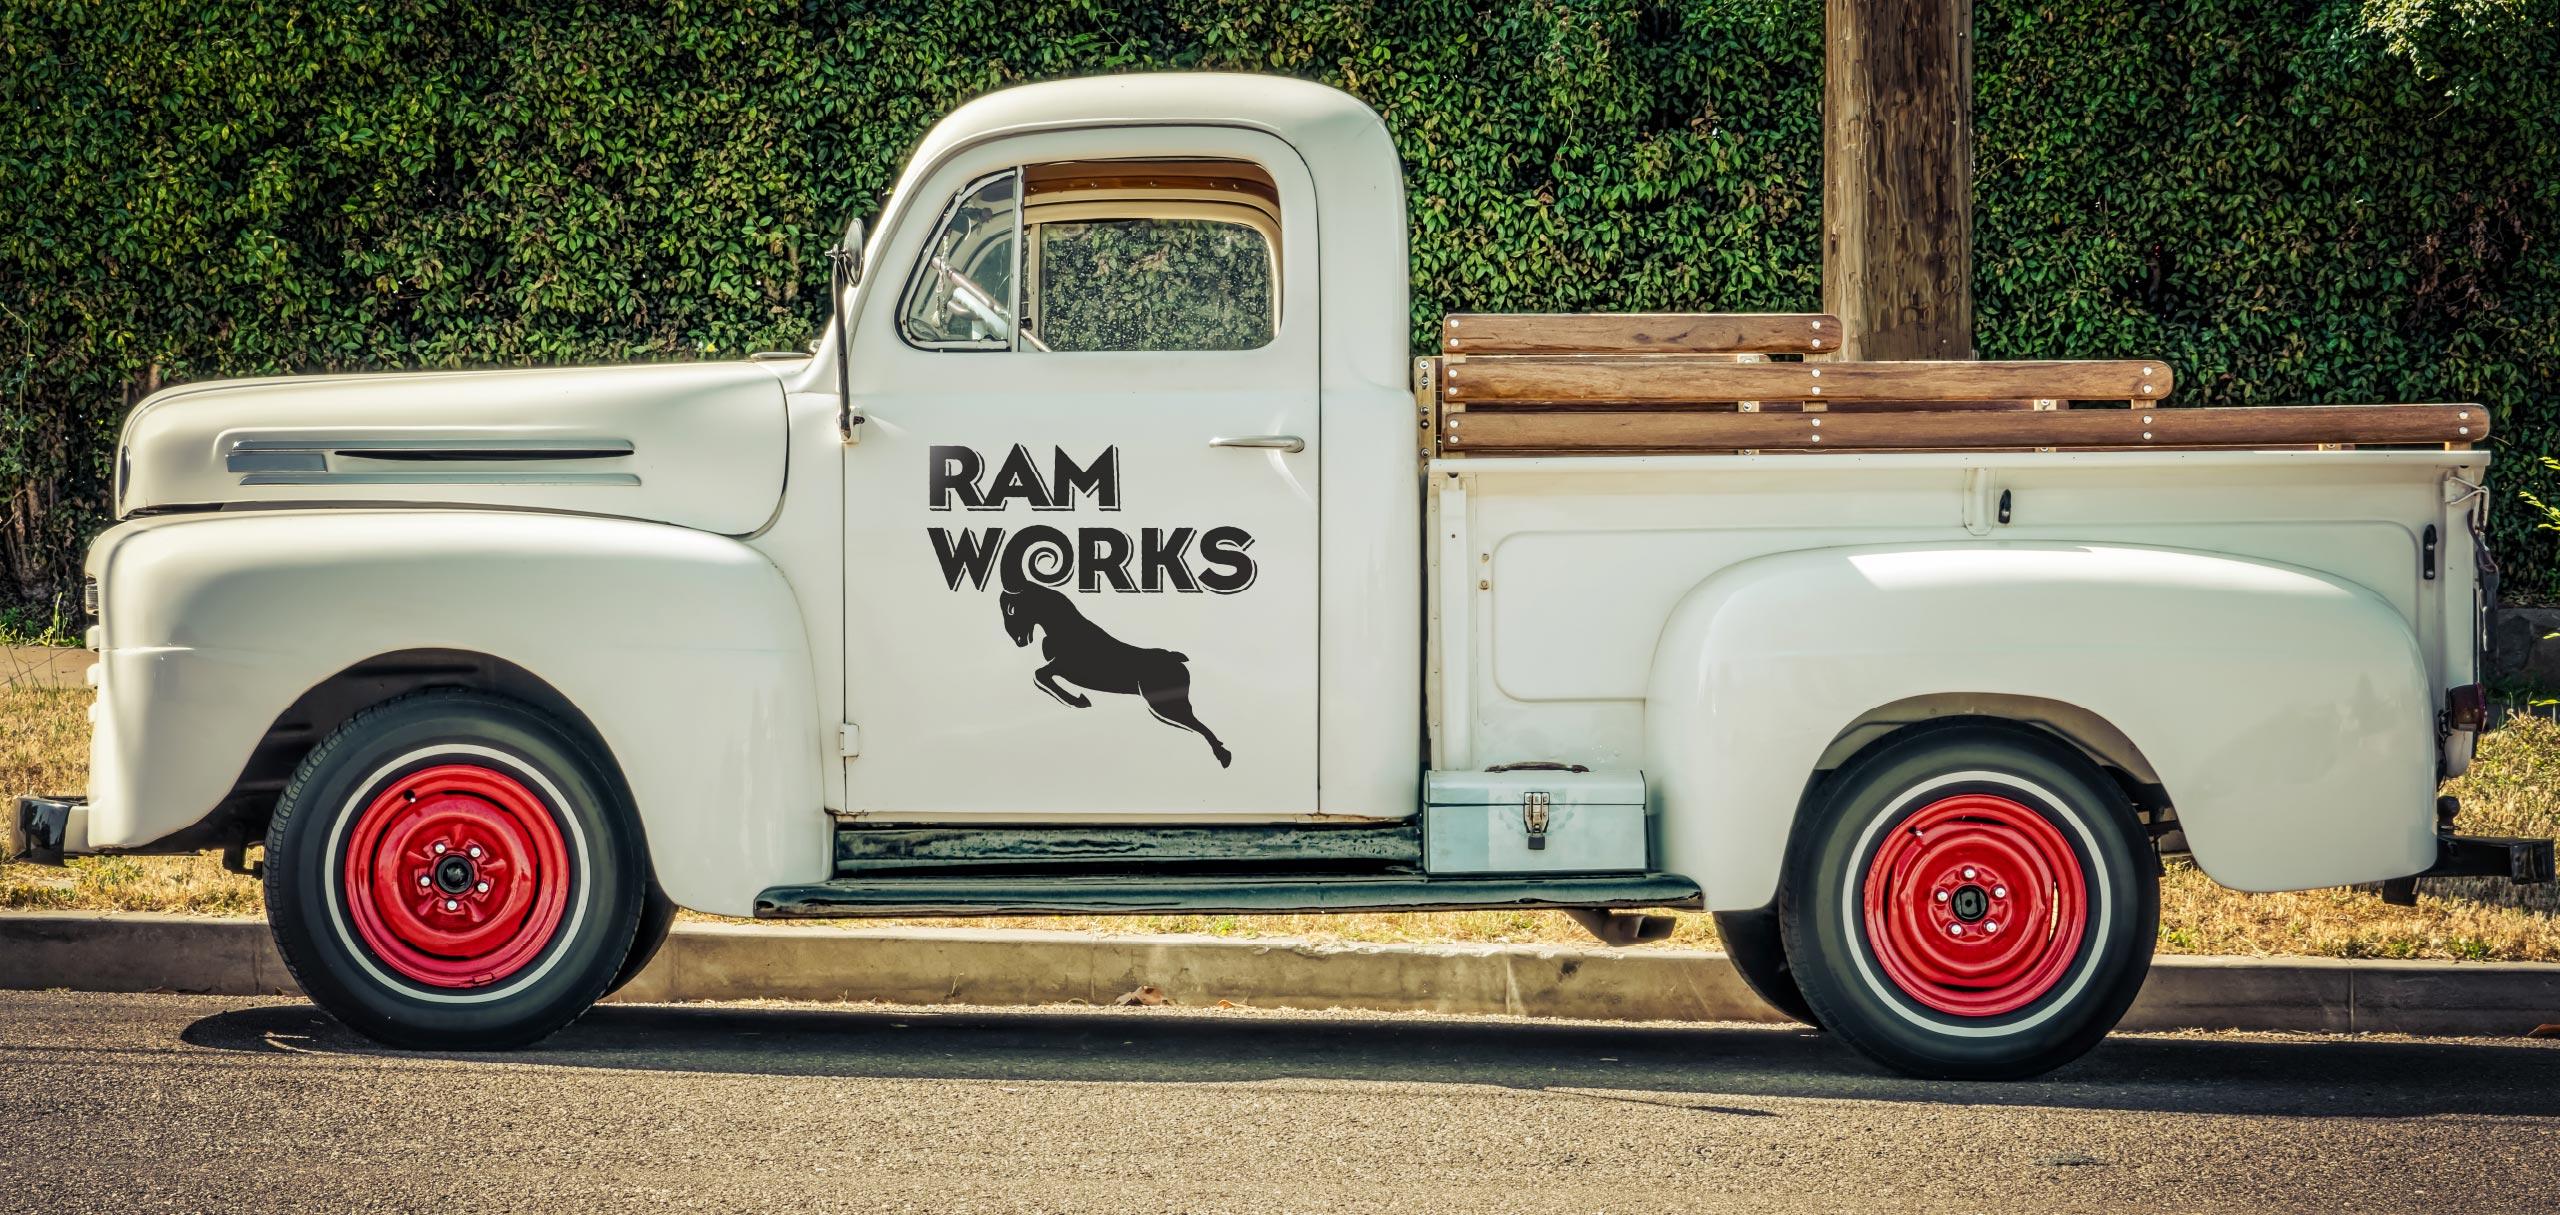 Ram Works truck